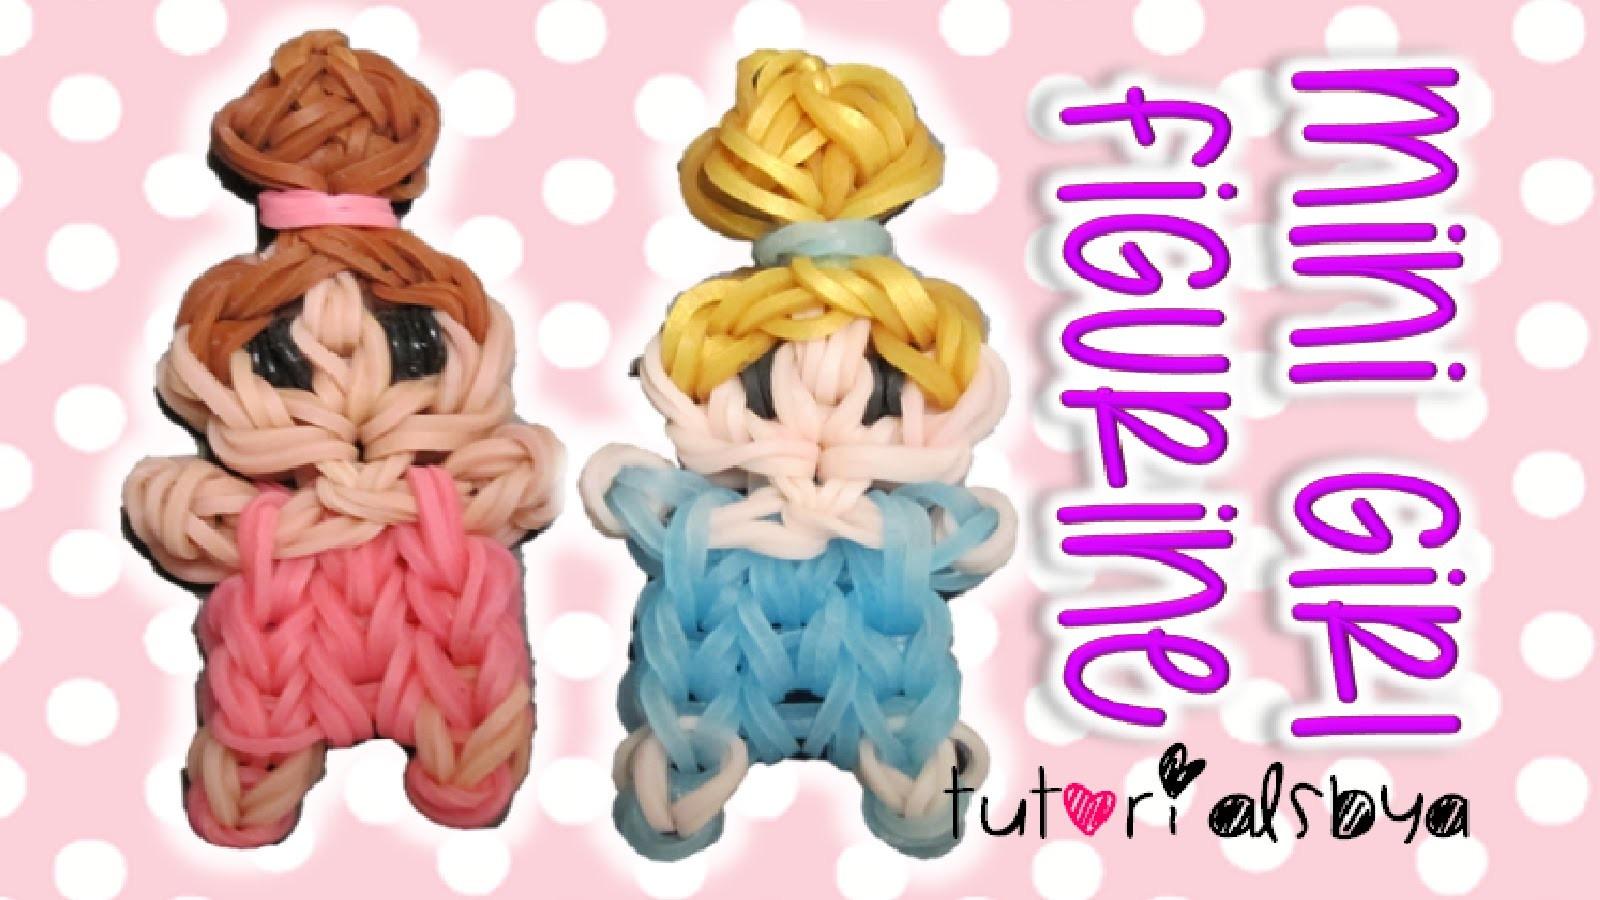 Cute Mini Baby Girl Person Charm. Figurine Rainbow Loom Tutorial | How To